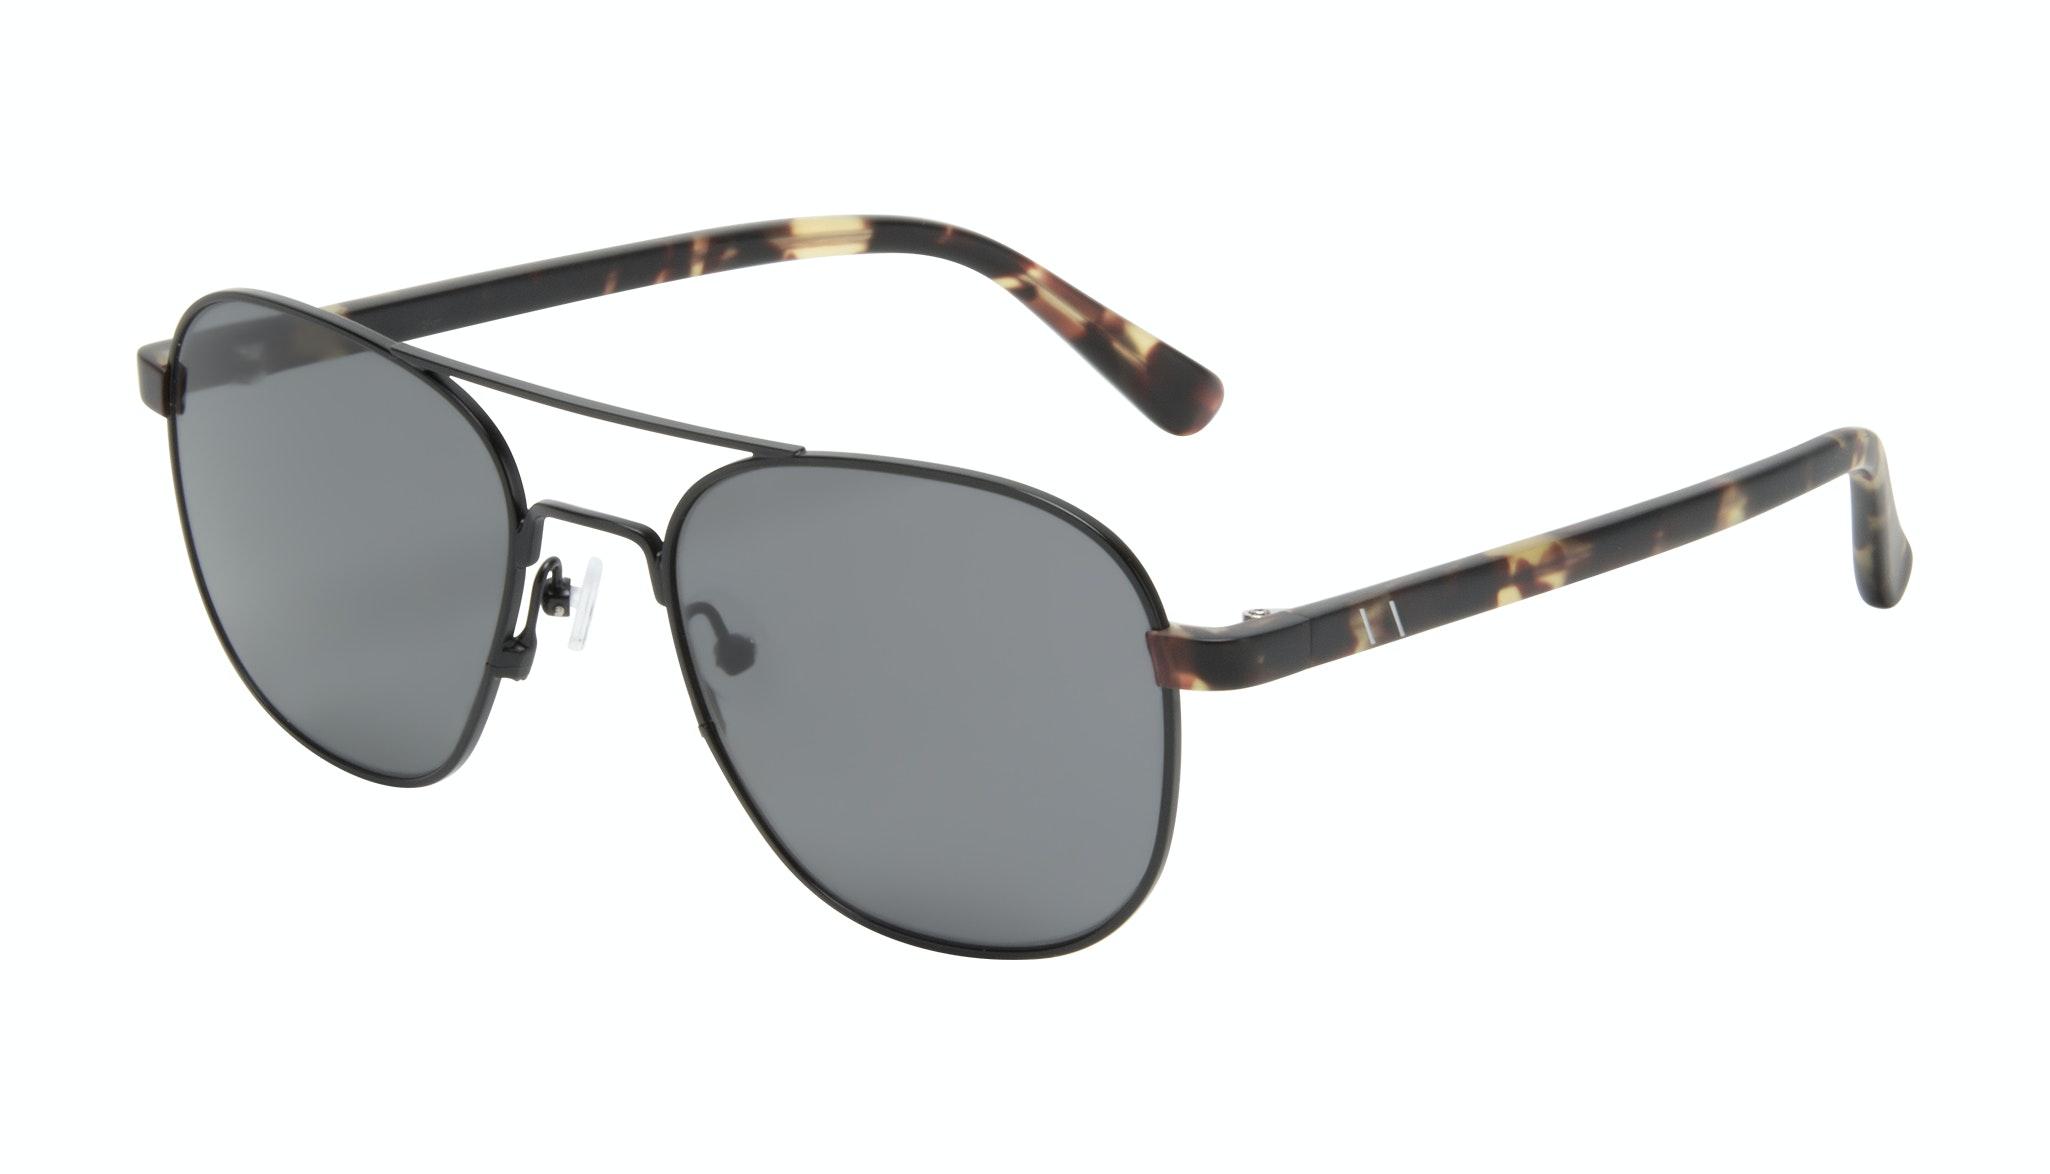 Affordable Fashion Glasses Aviator Sunglasses Men Pulse Gun Metal Tilt